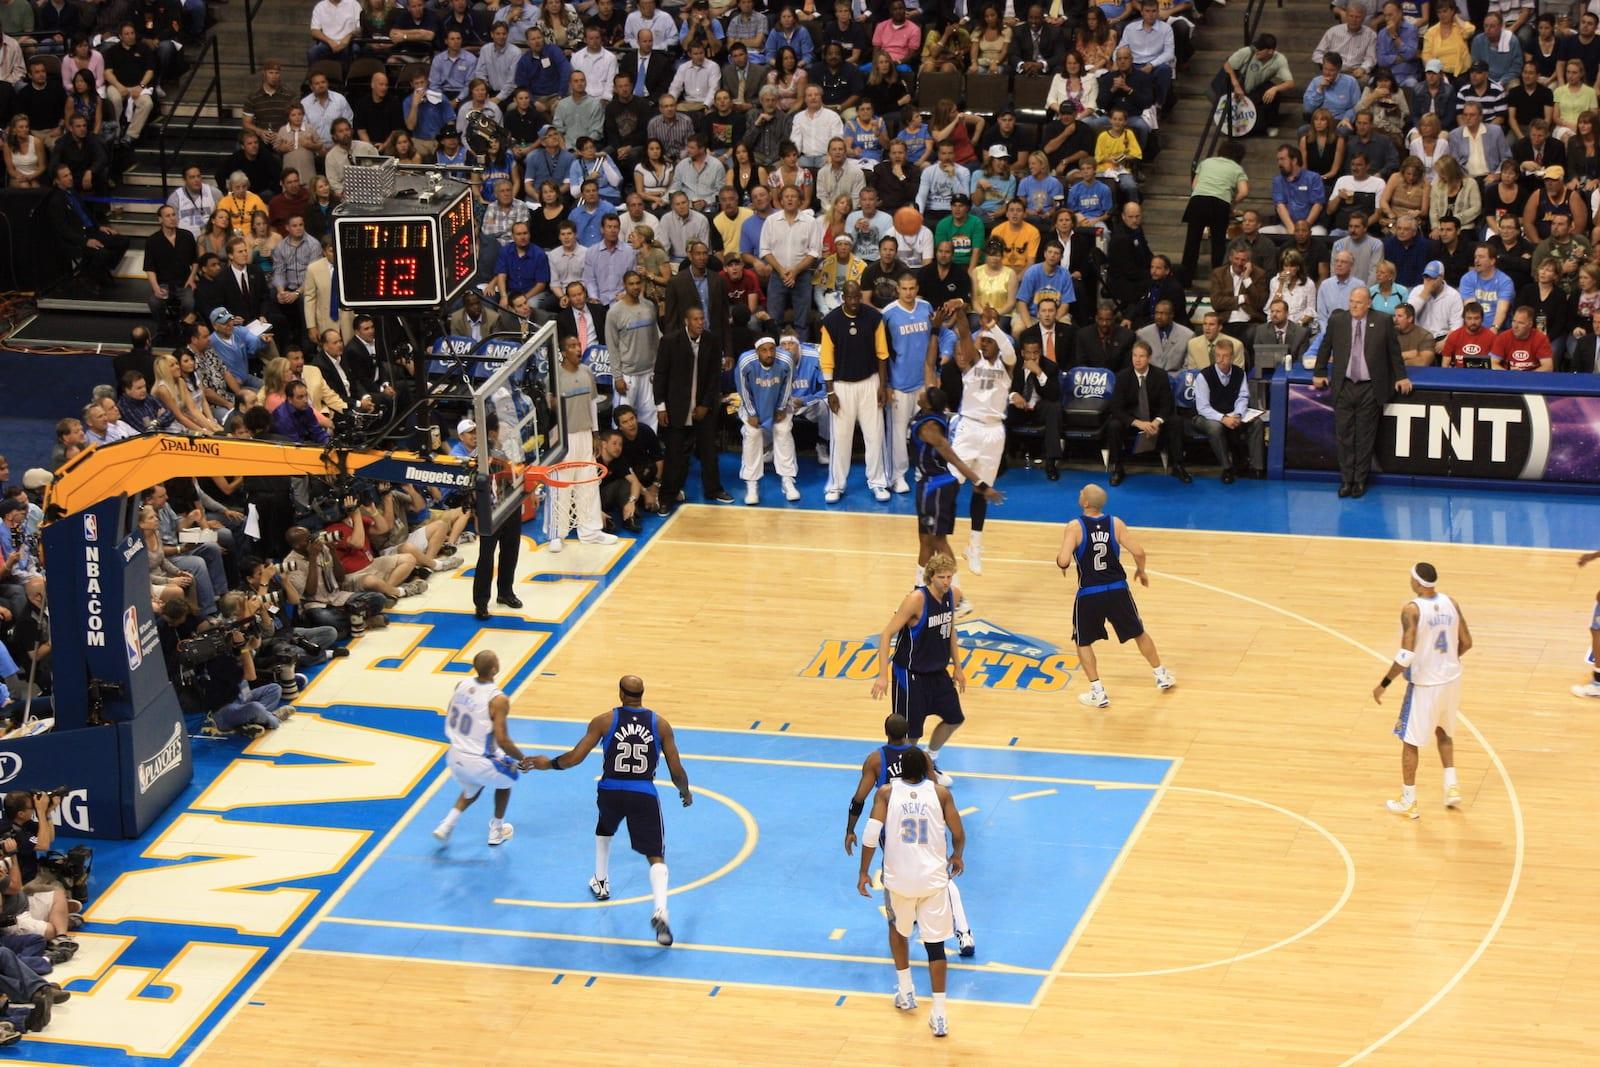 Professional Teams Denver Nuggets Basketball Game Pepsi Center